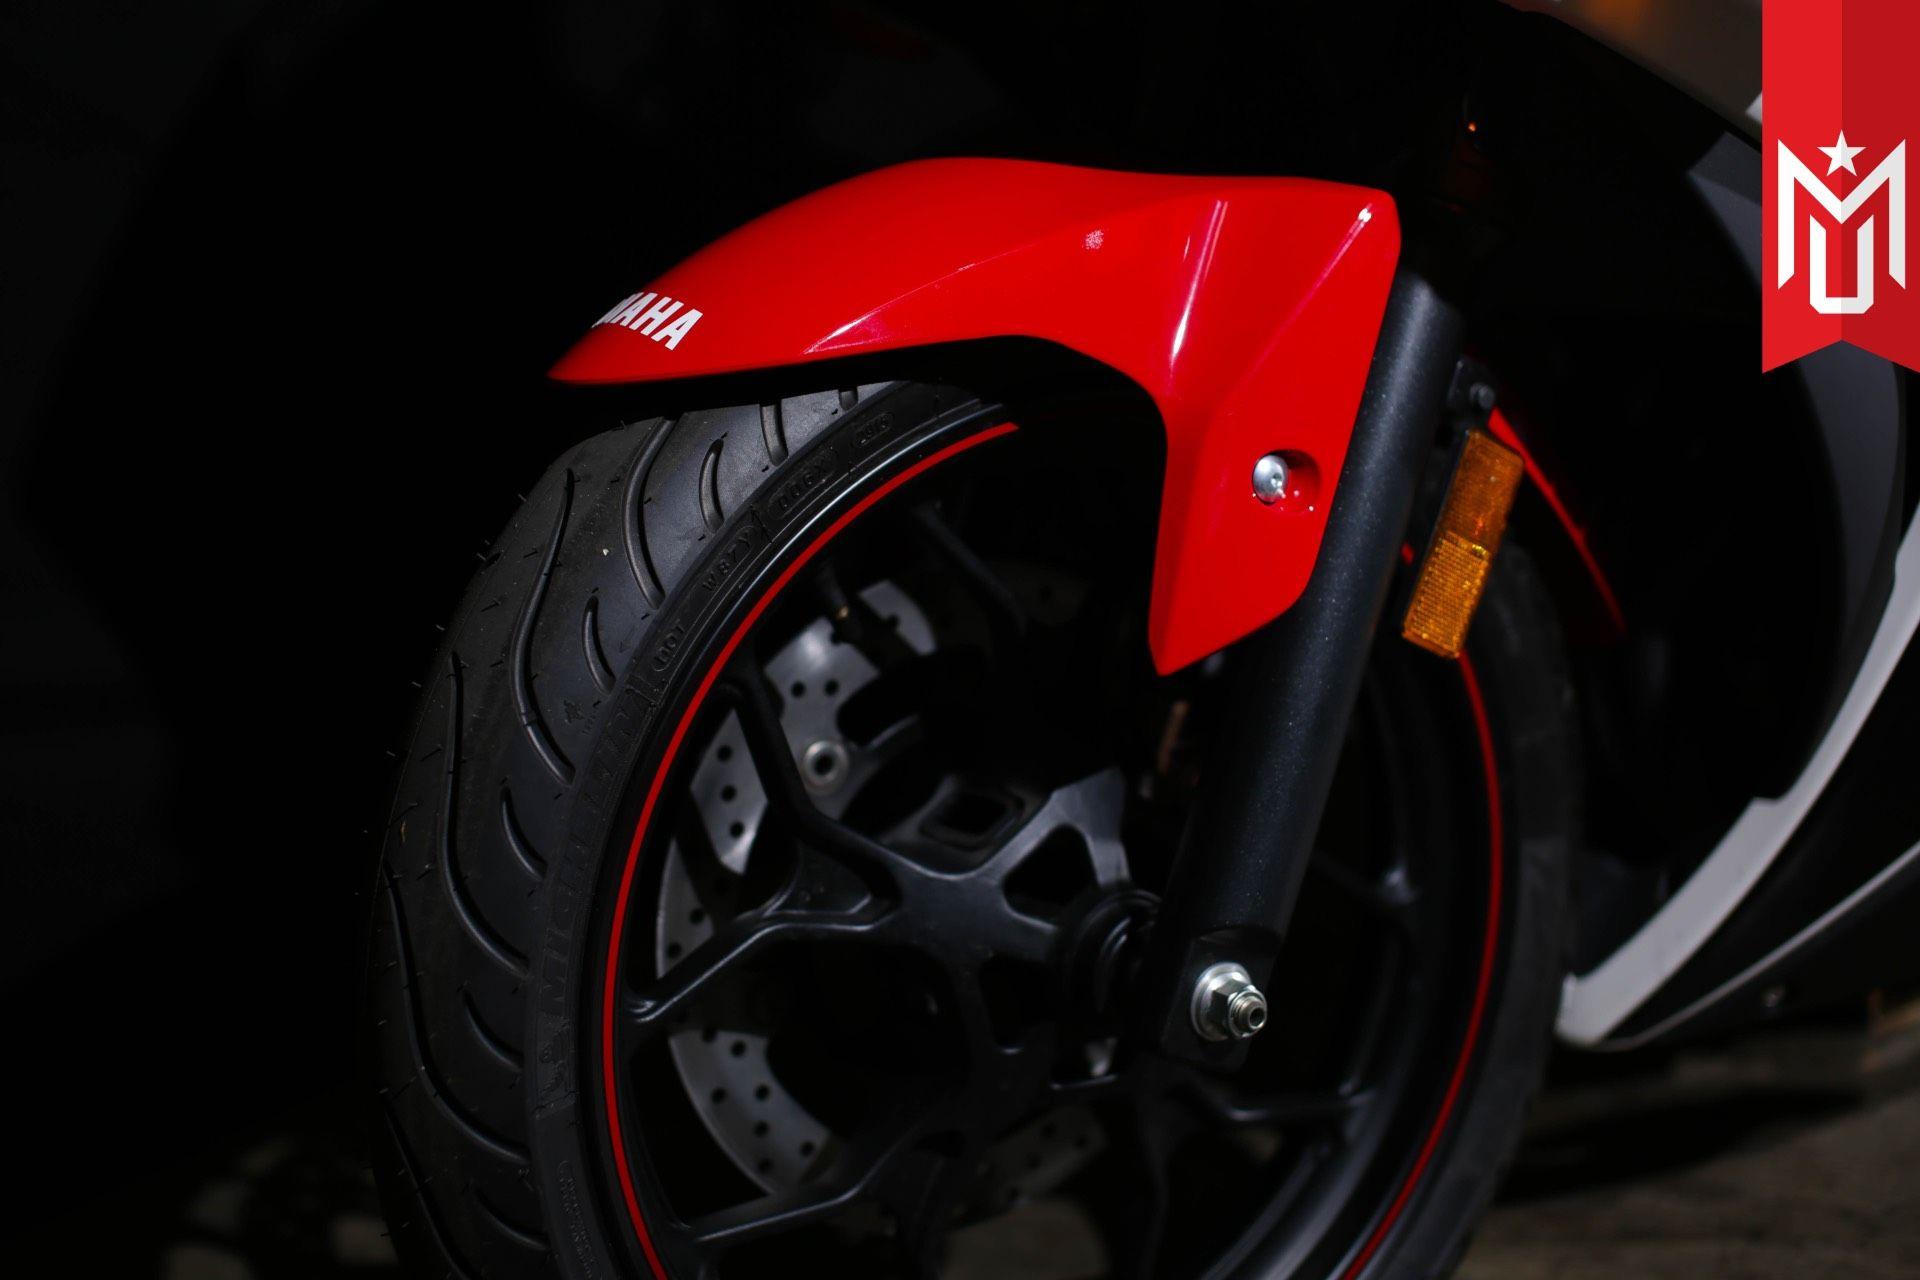 2016 Yamaha YZF-R3 10